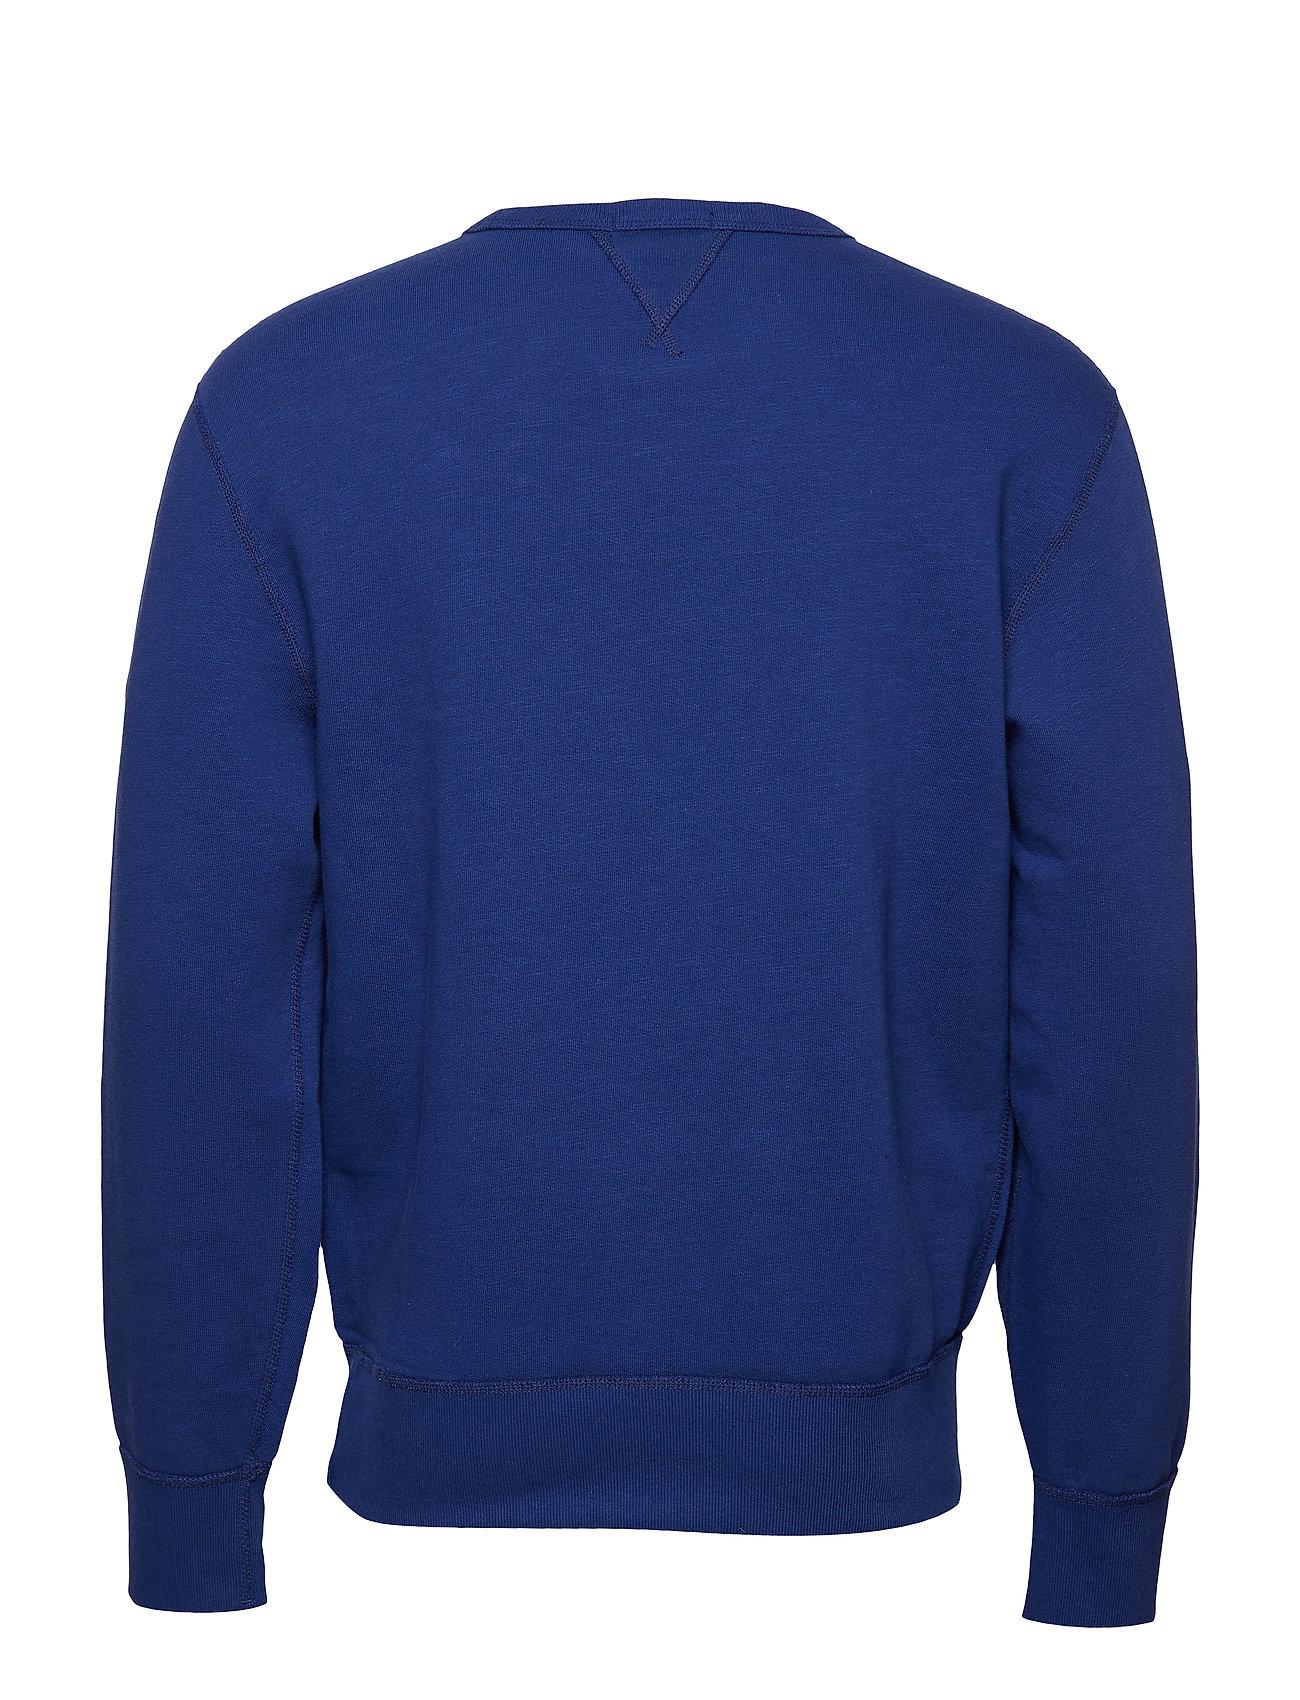 Ralph fleece BluePolo Lauren Sweatshirtyale blend Cotton L5j3RA4